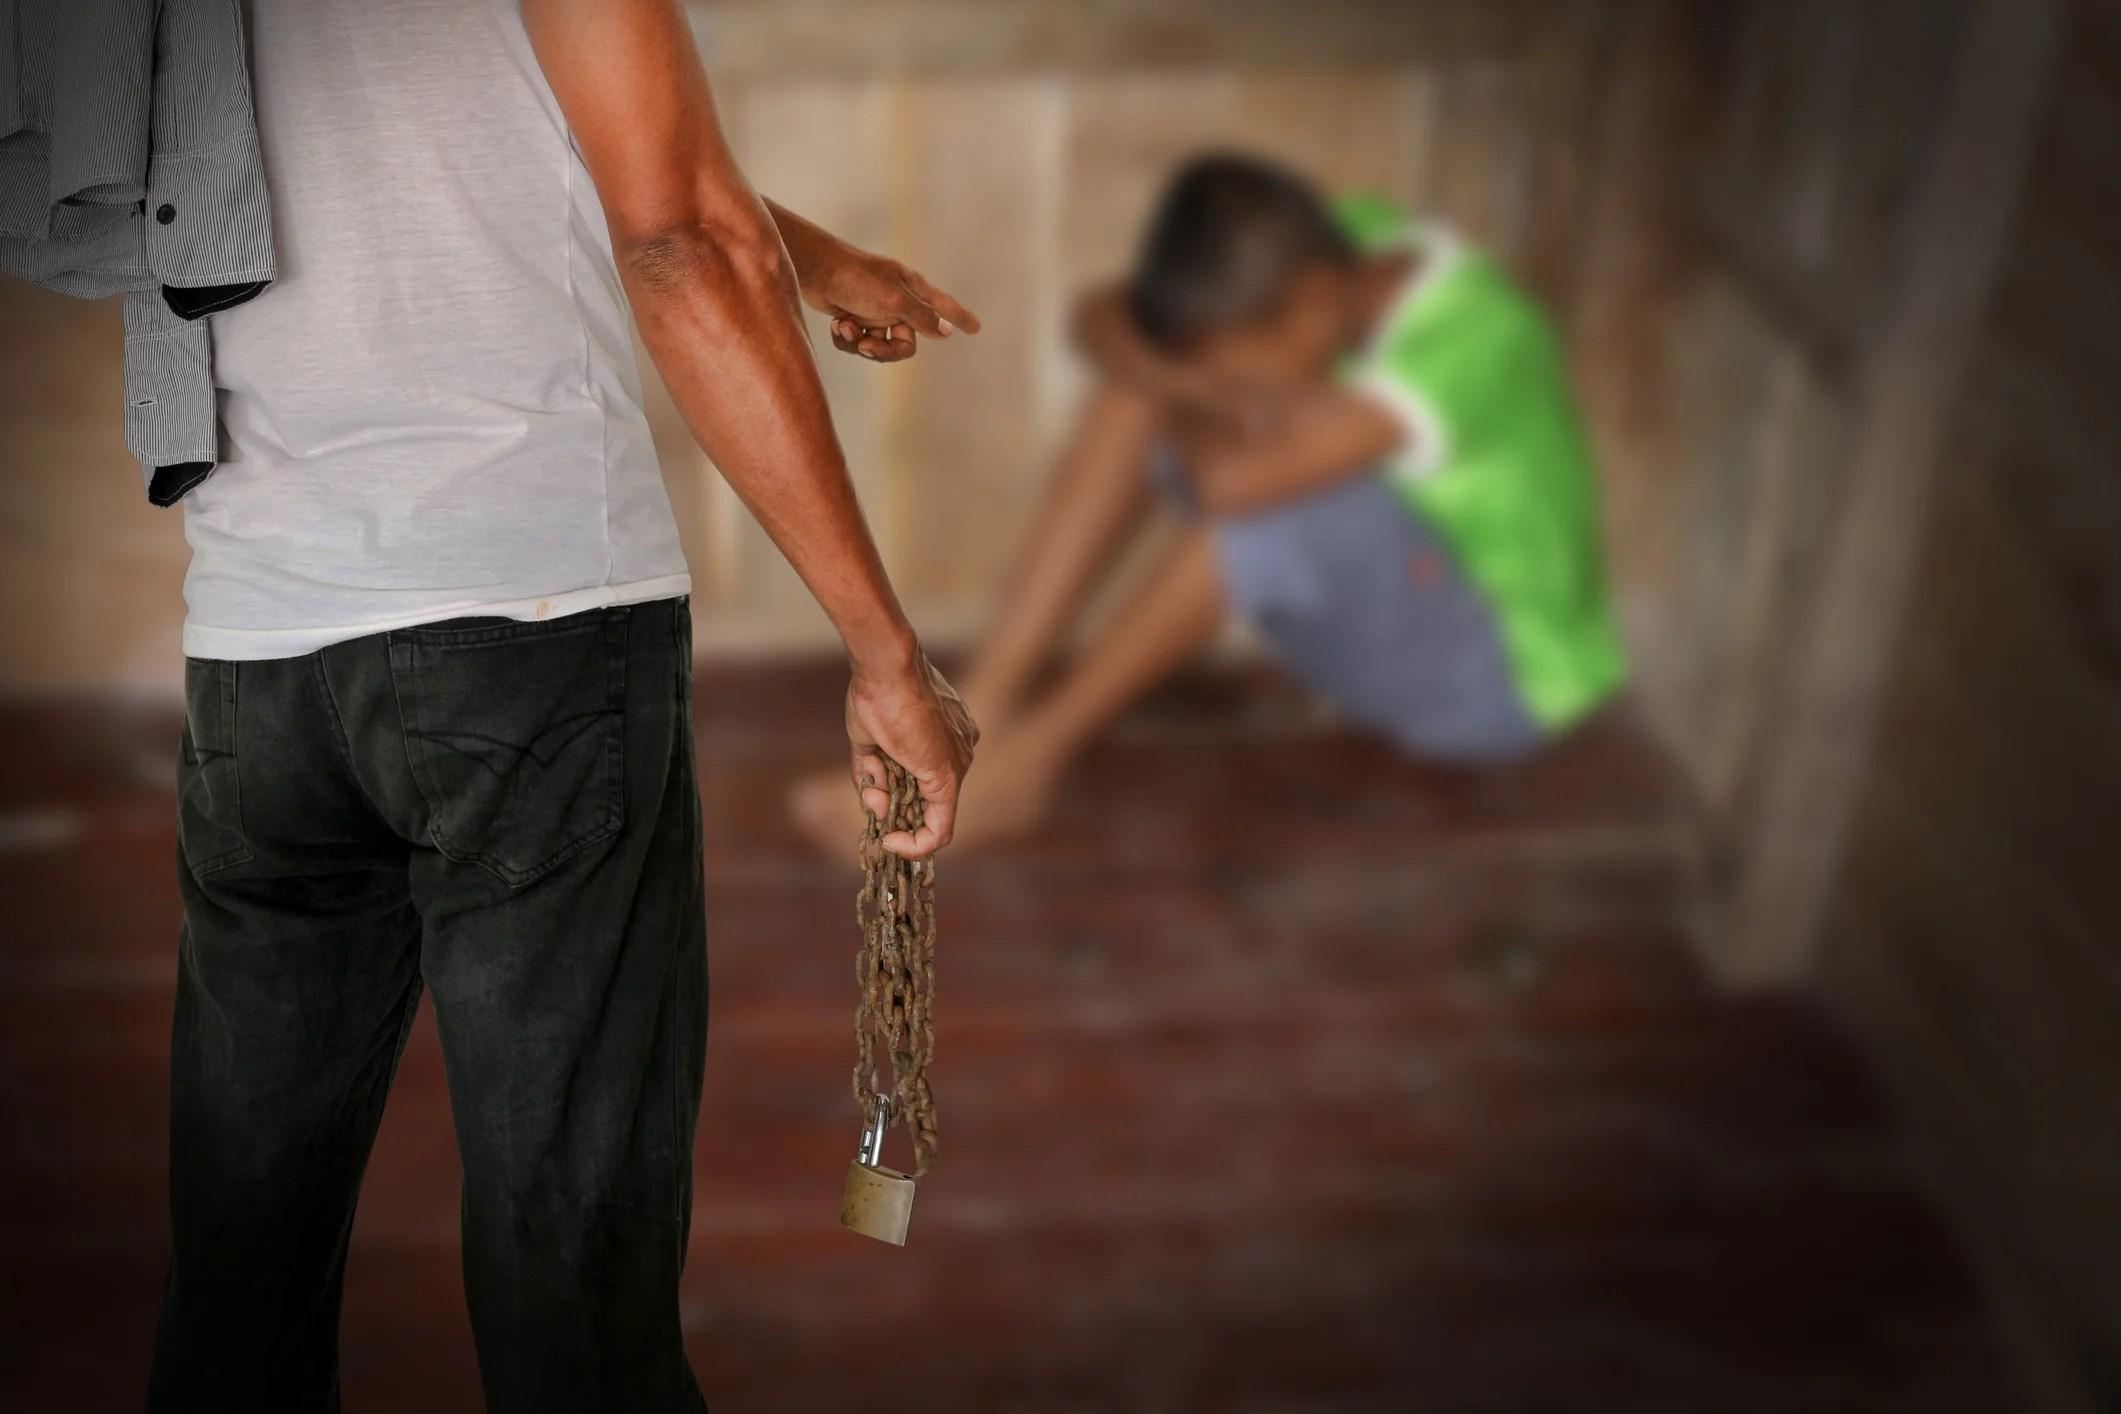 Картинки торговля людьми